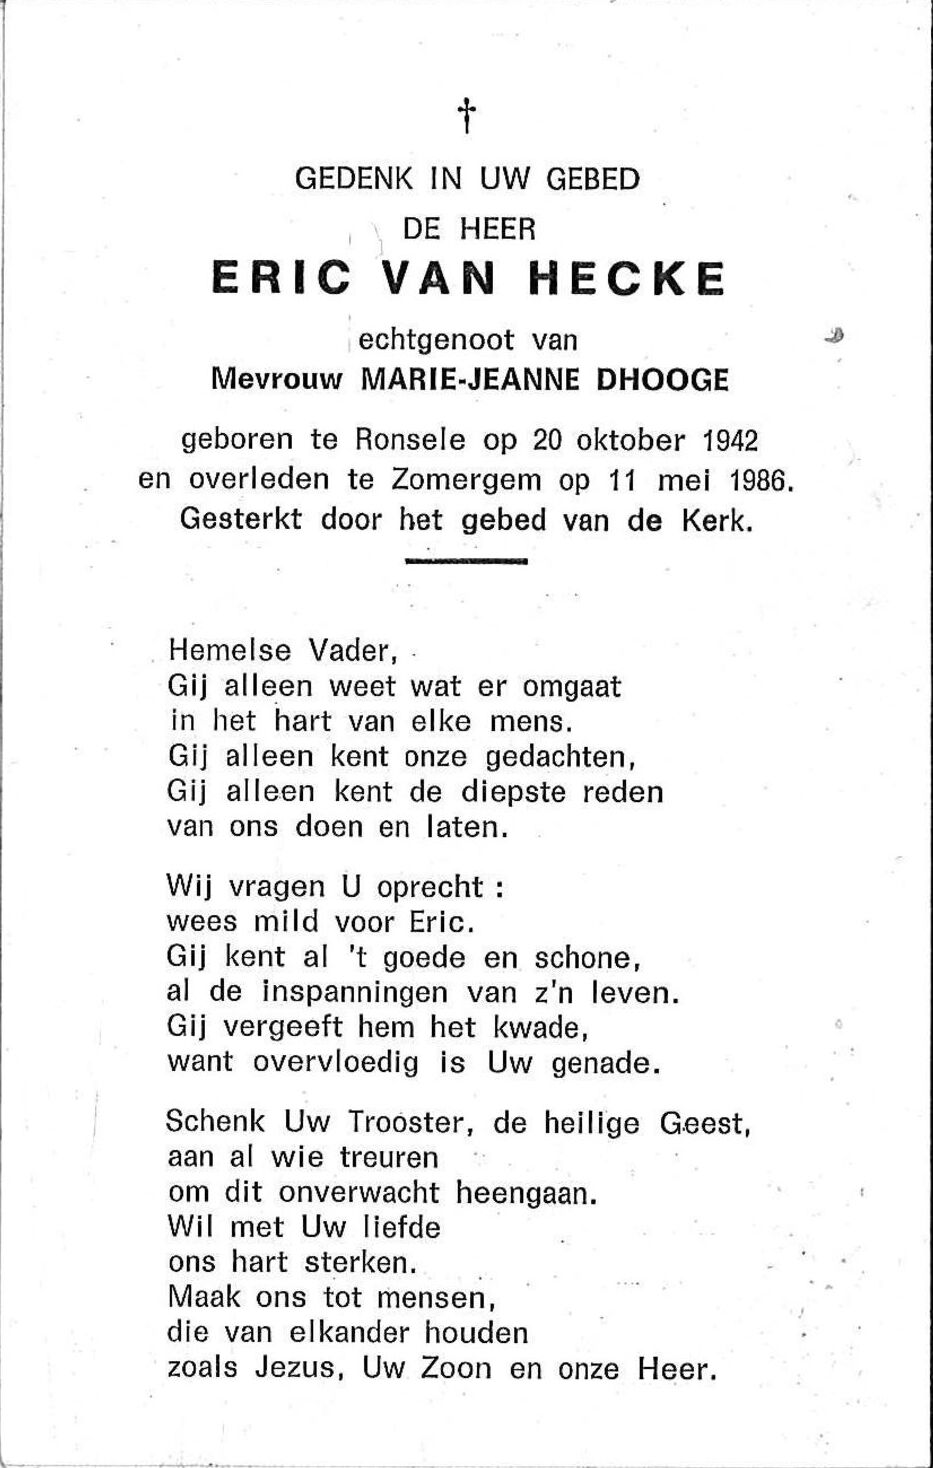 Eric van Hecke